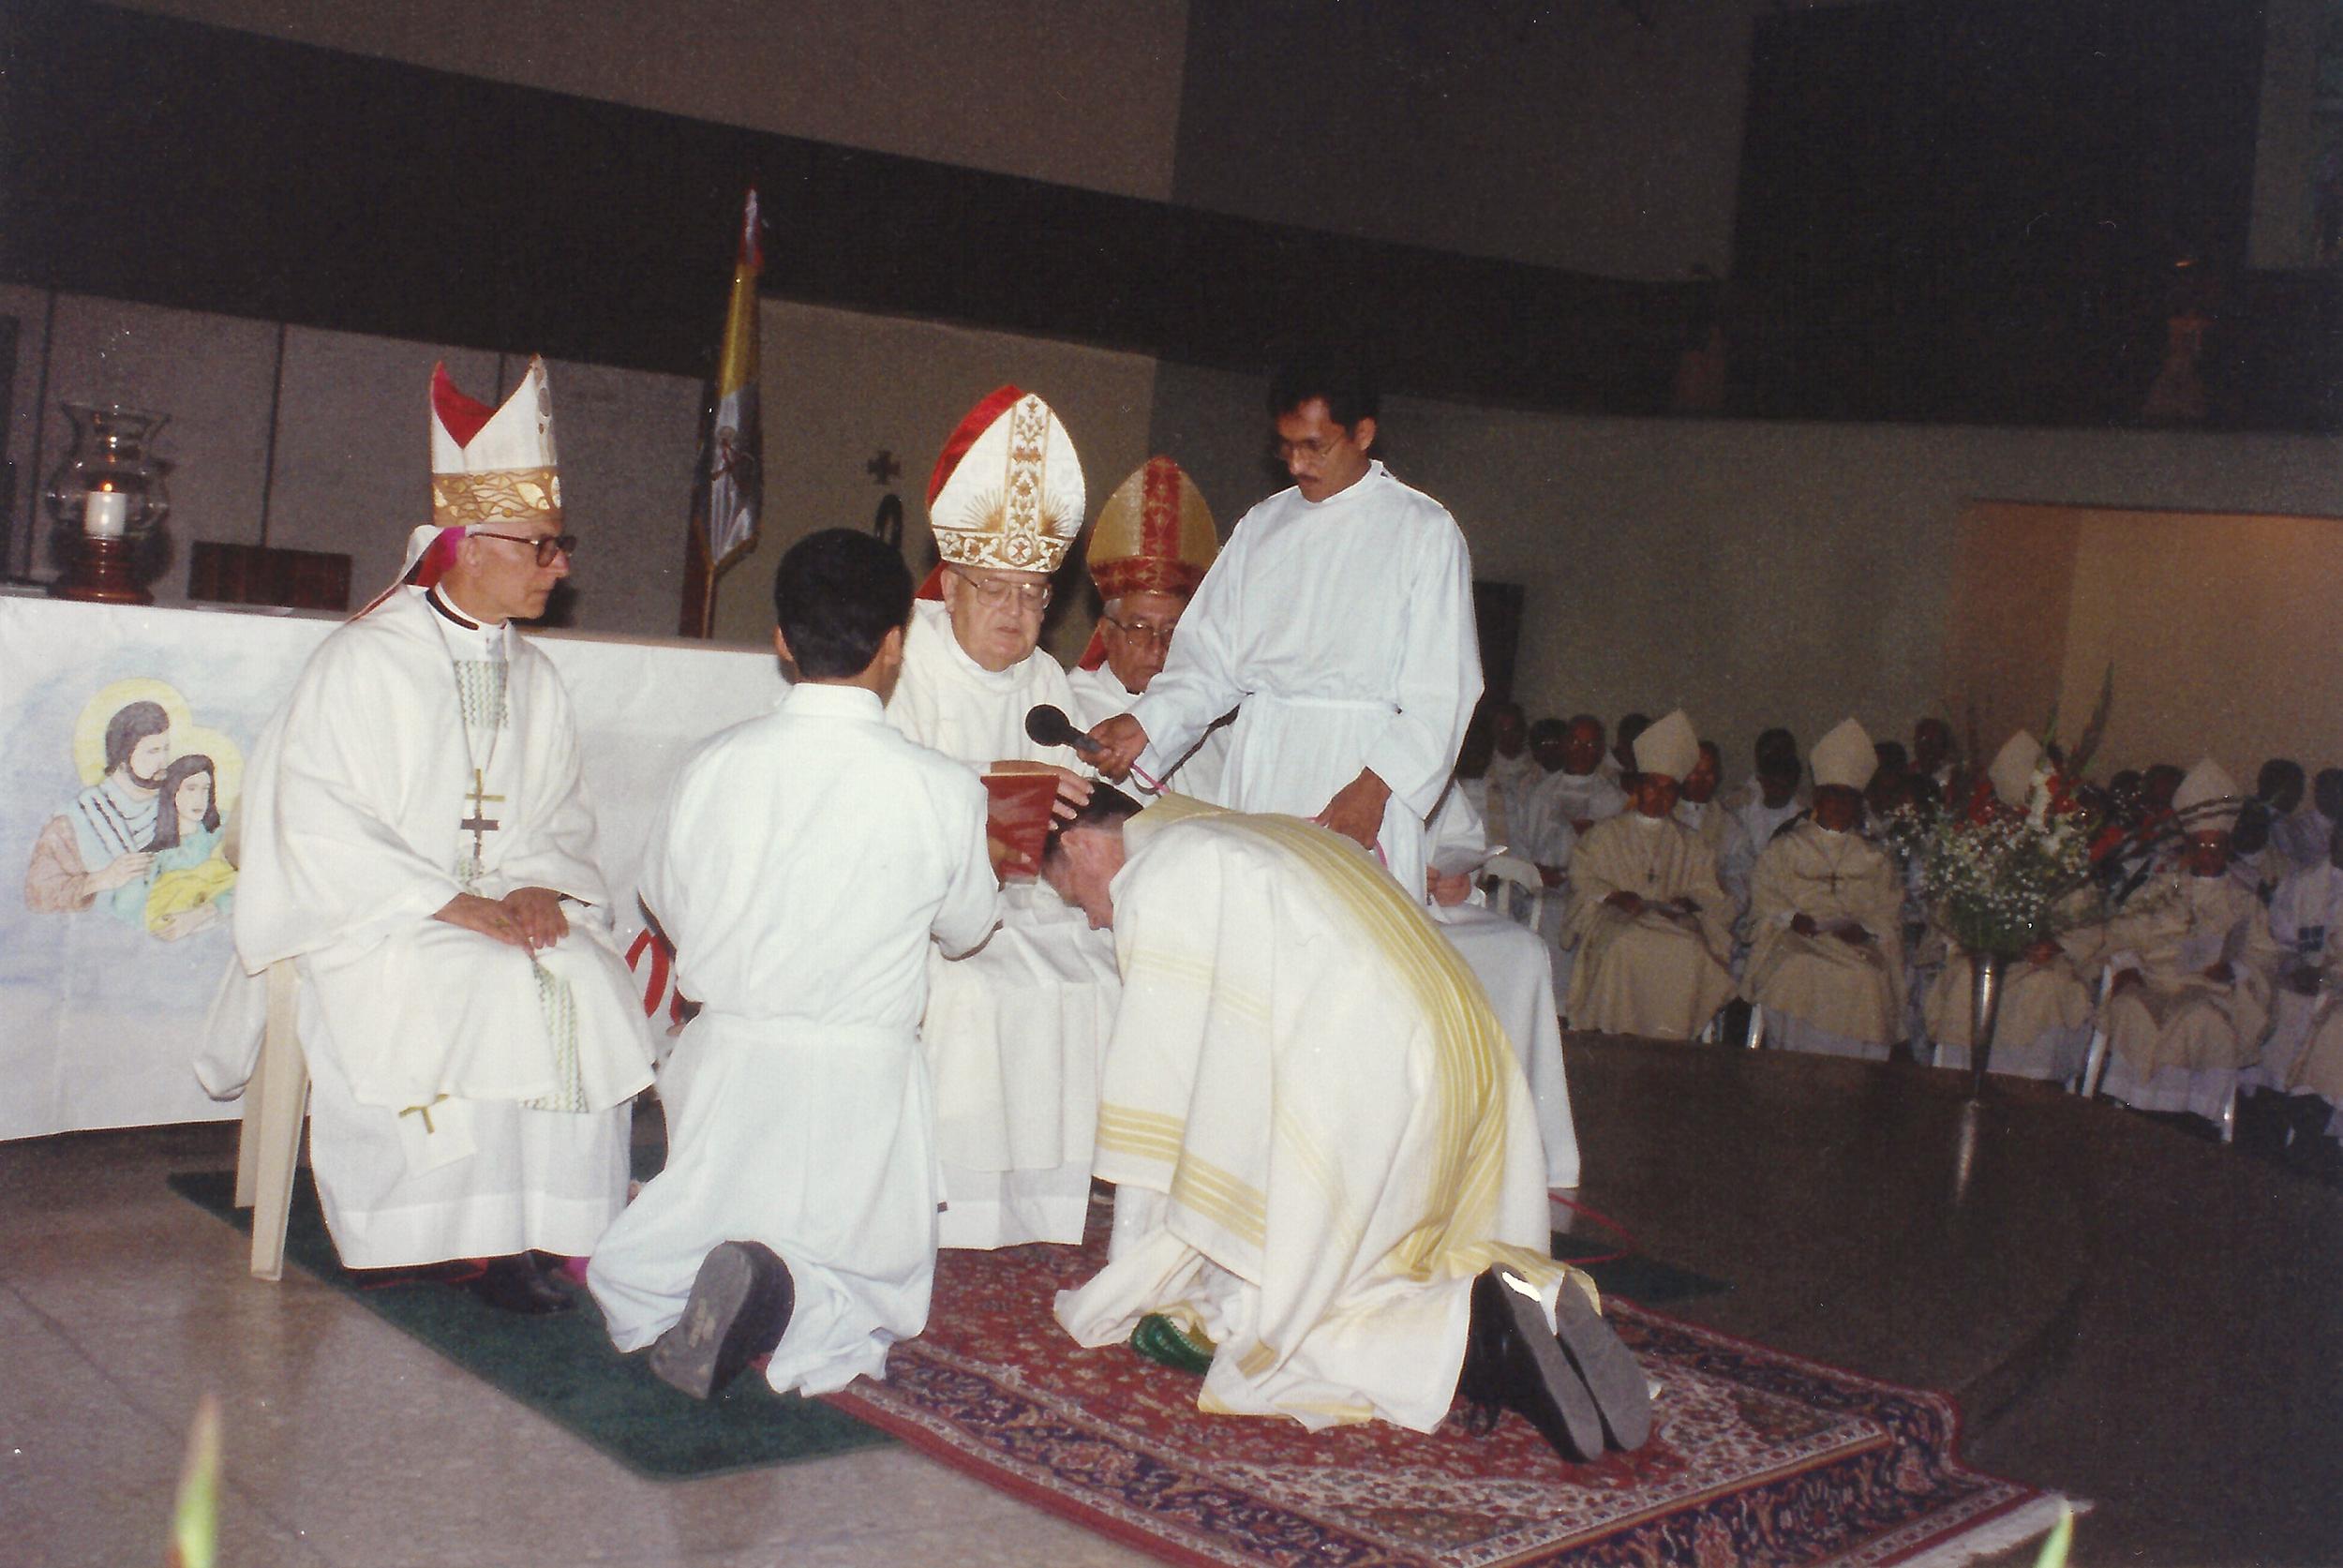 Bishop John McNabb, O.S.A., ordains Dan Turley, O.S.A., to the Episcopate